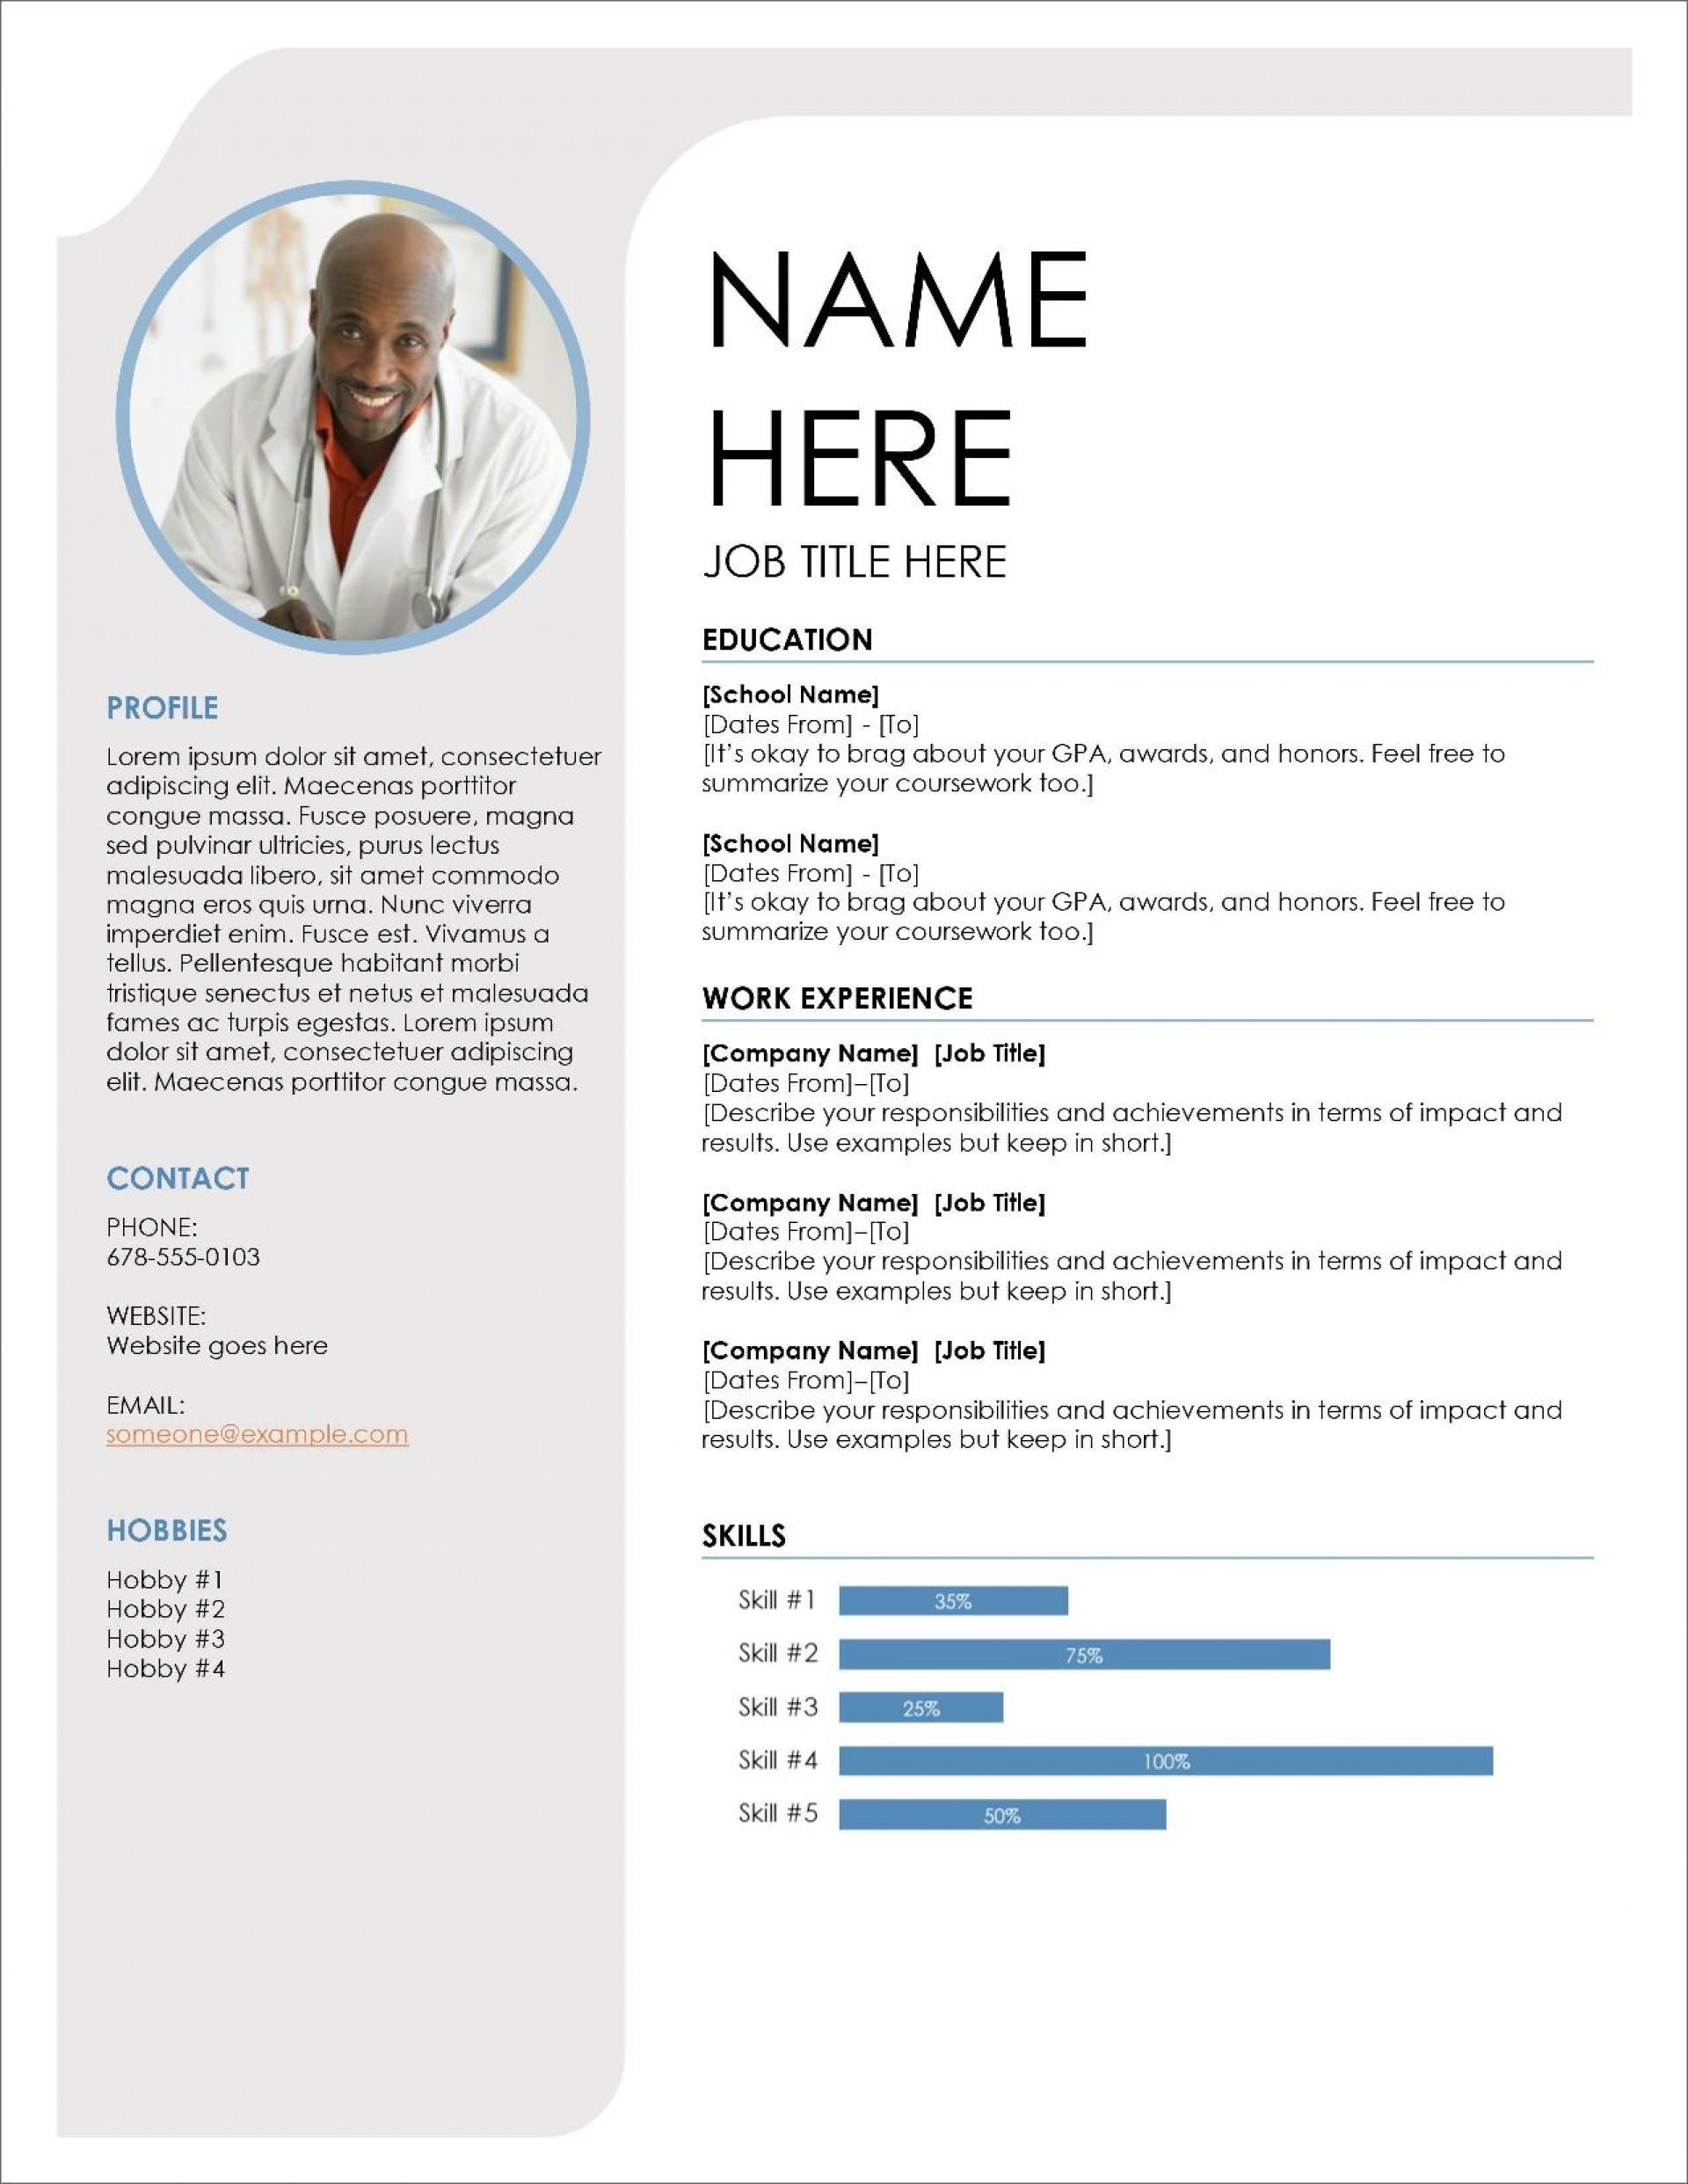 005 Rare Resume Template On Word Design  Free Download Australia Microsoft Office 2007 Philippine1920